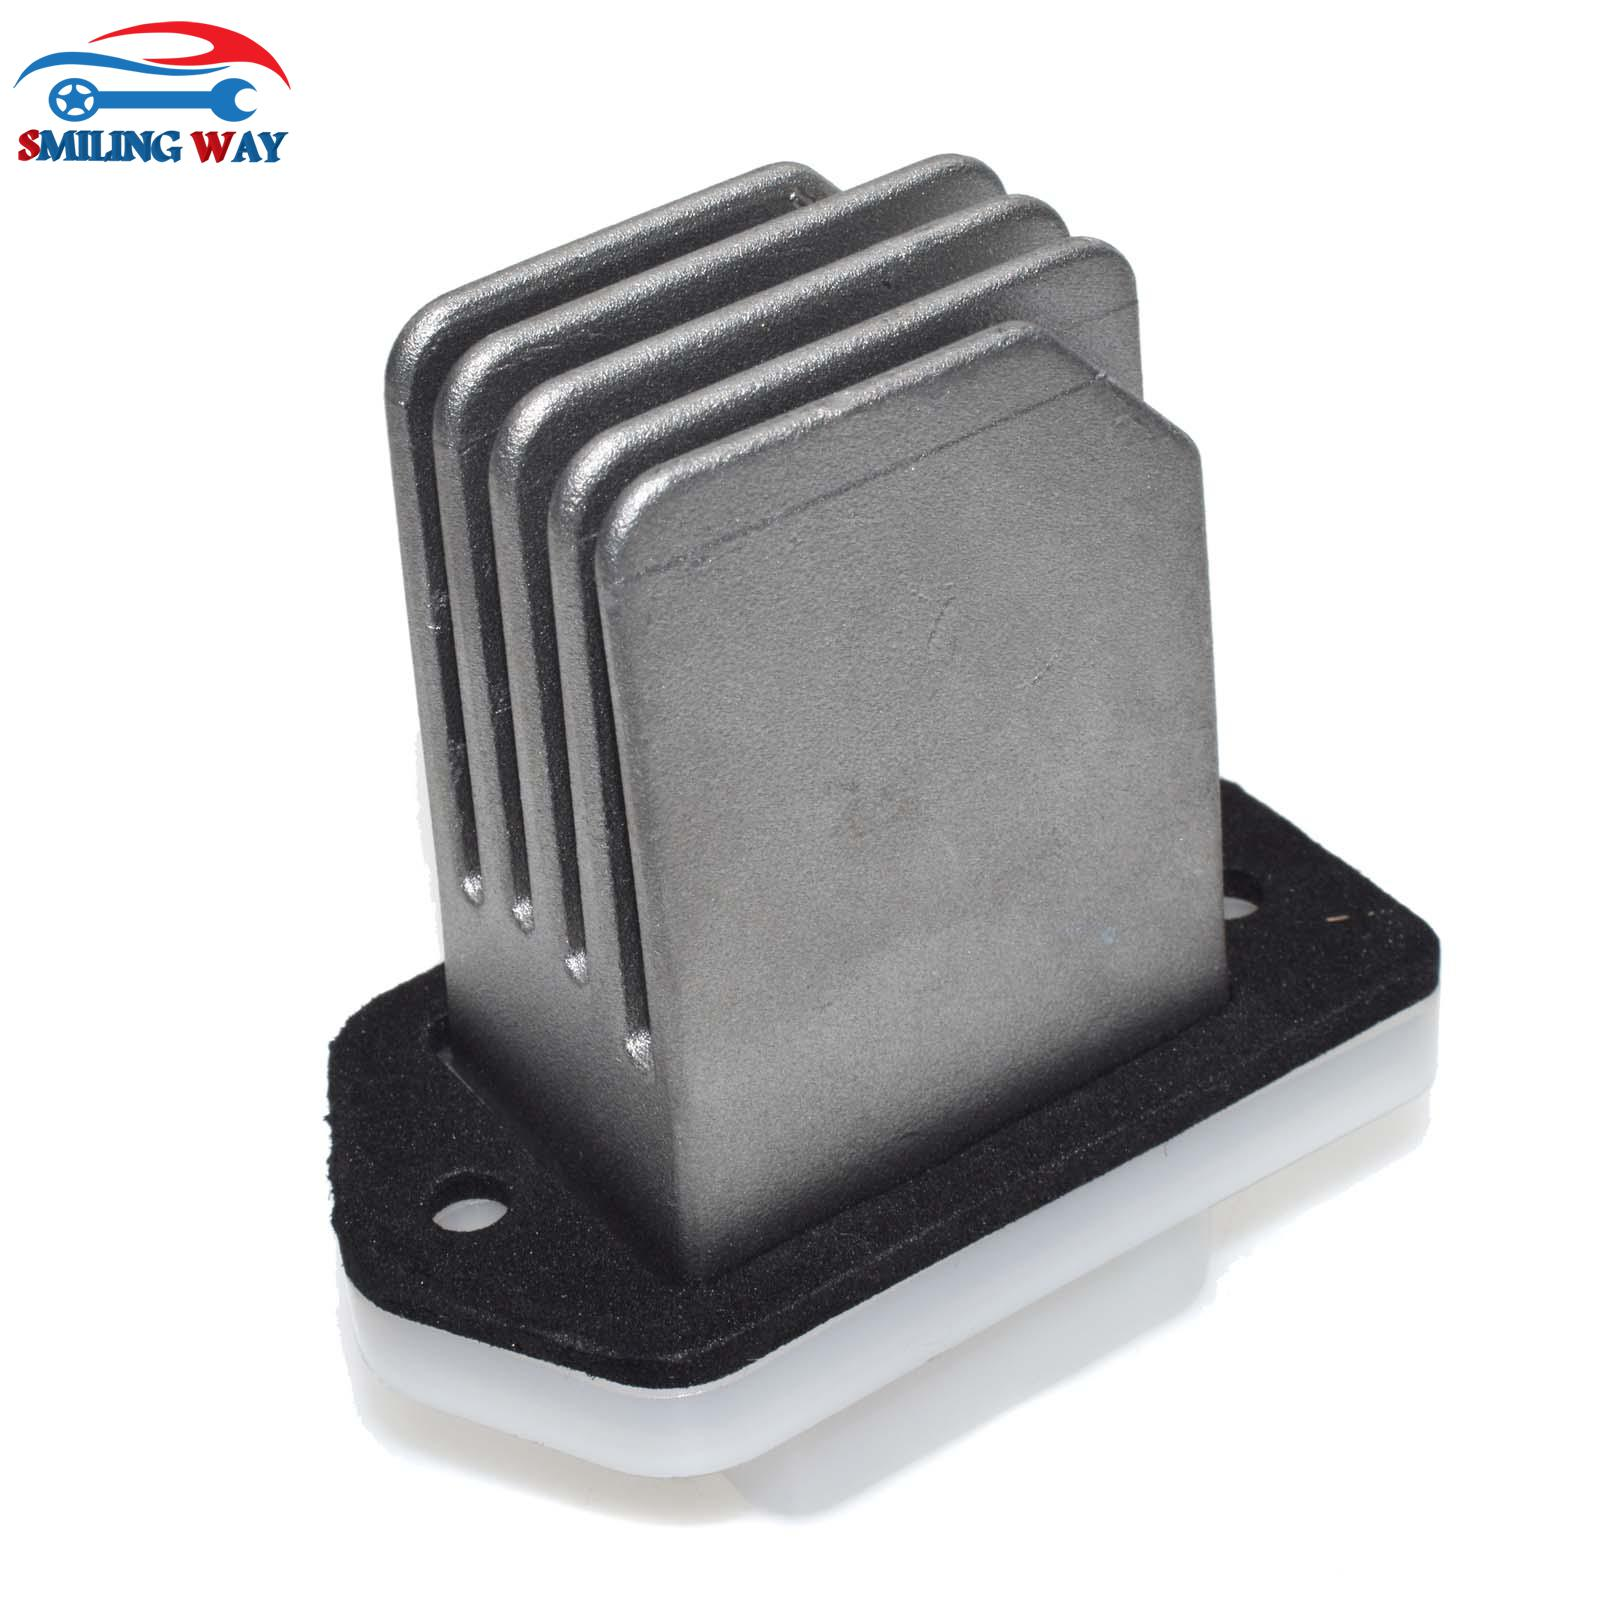 SMILING WAY# Blower Motor Resistor For Nissan NV1500 NV2500 NV3500  2012-2013, Rogue 2008-2013, Sentra 2007-2012 Amplifier Module